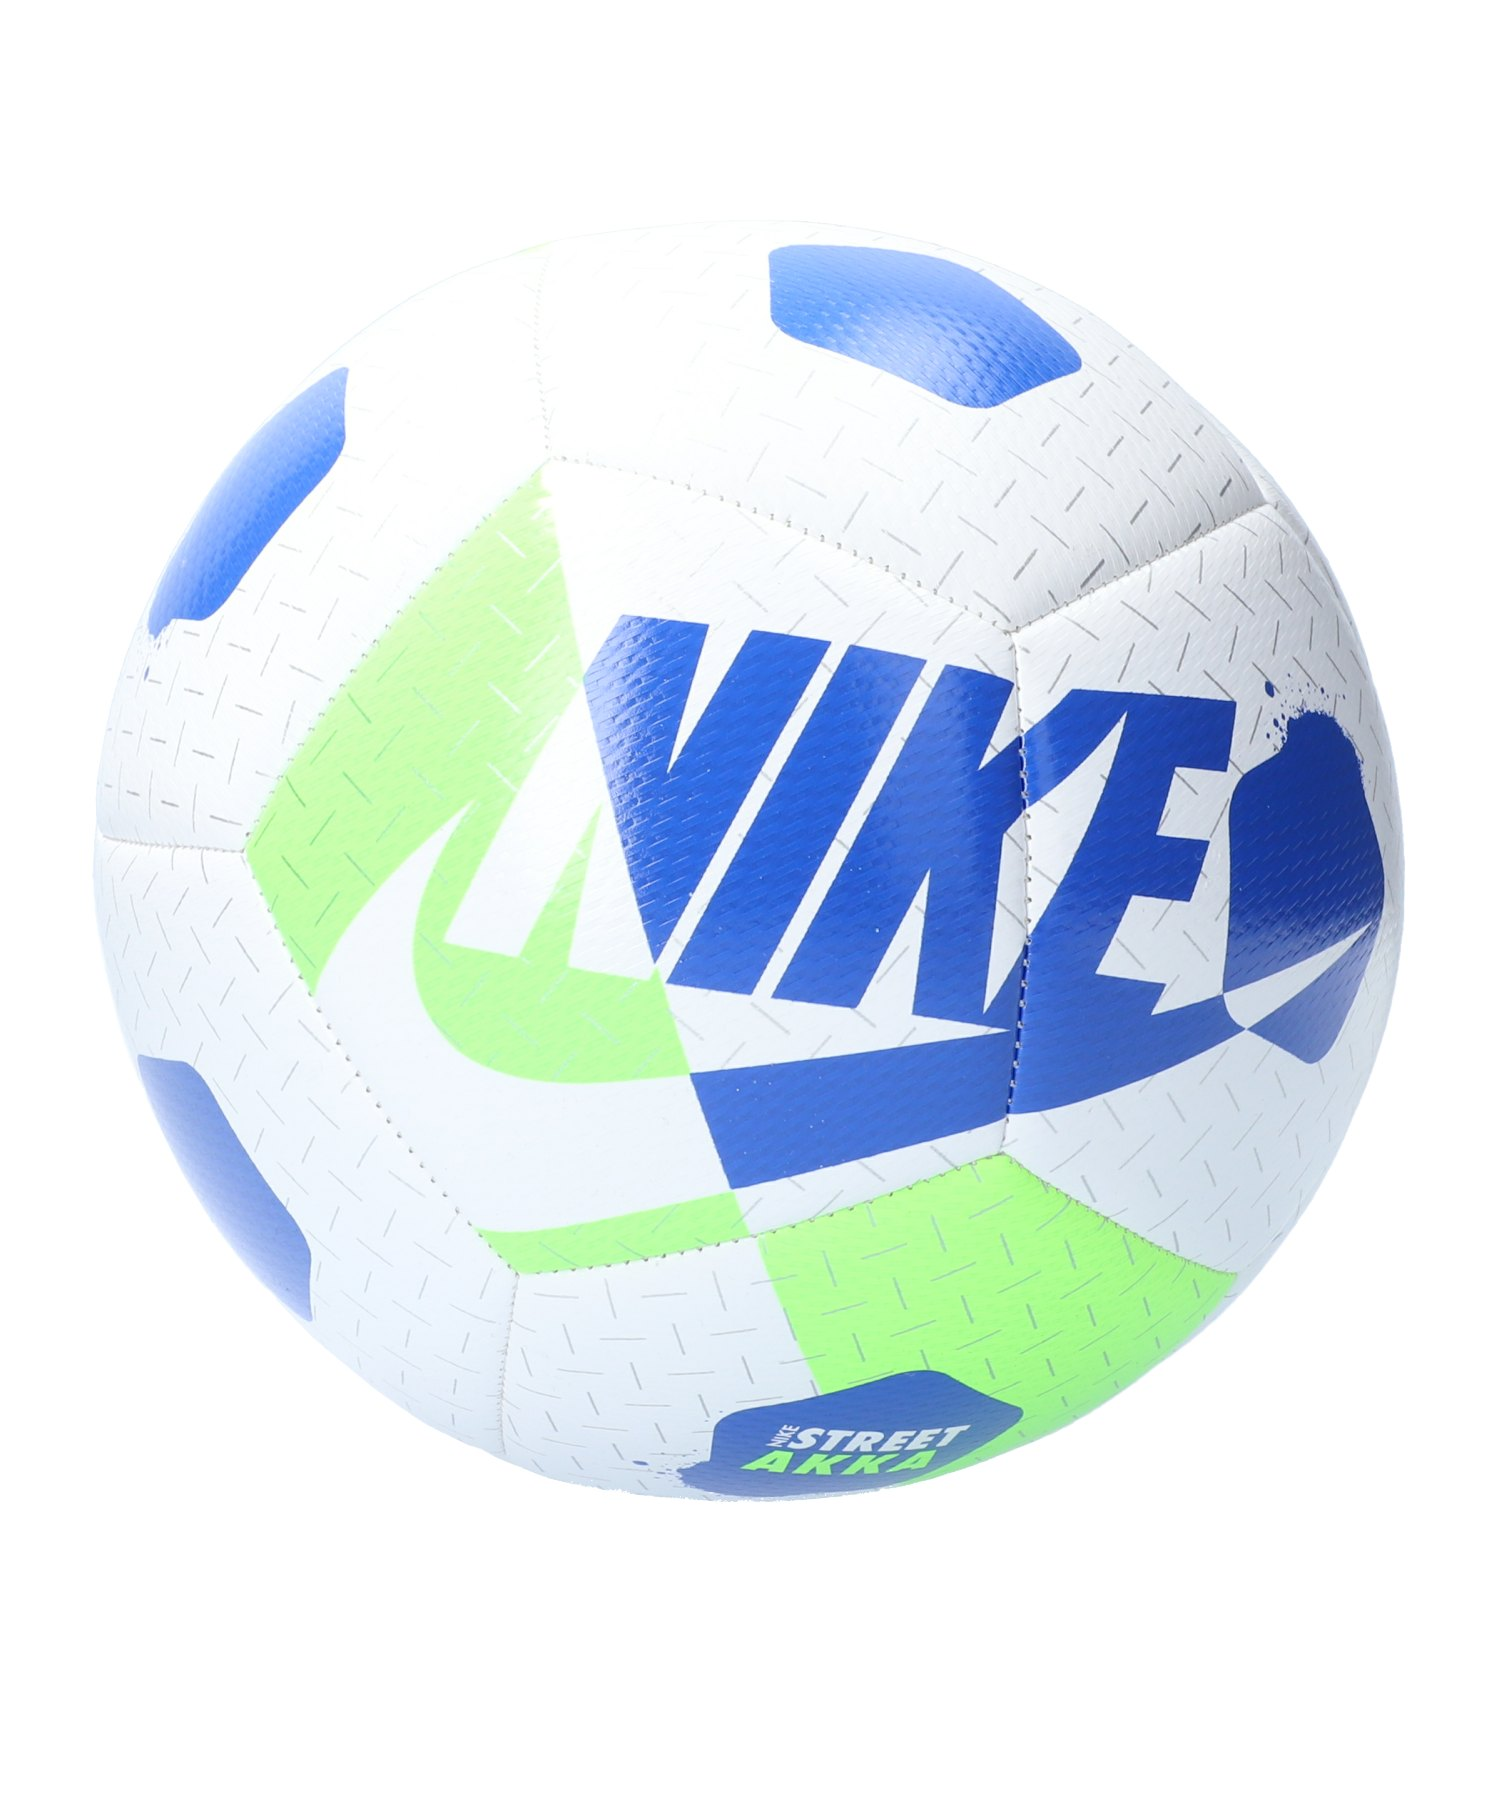 Nike Street Akka Trainingsball Weiss Grün F100 - weiss